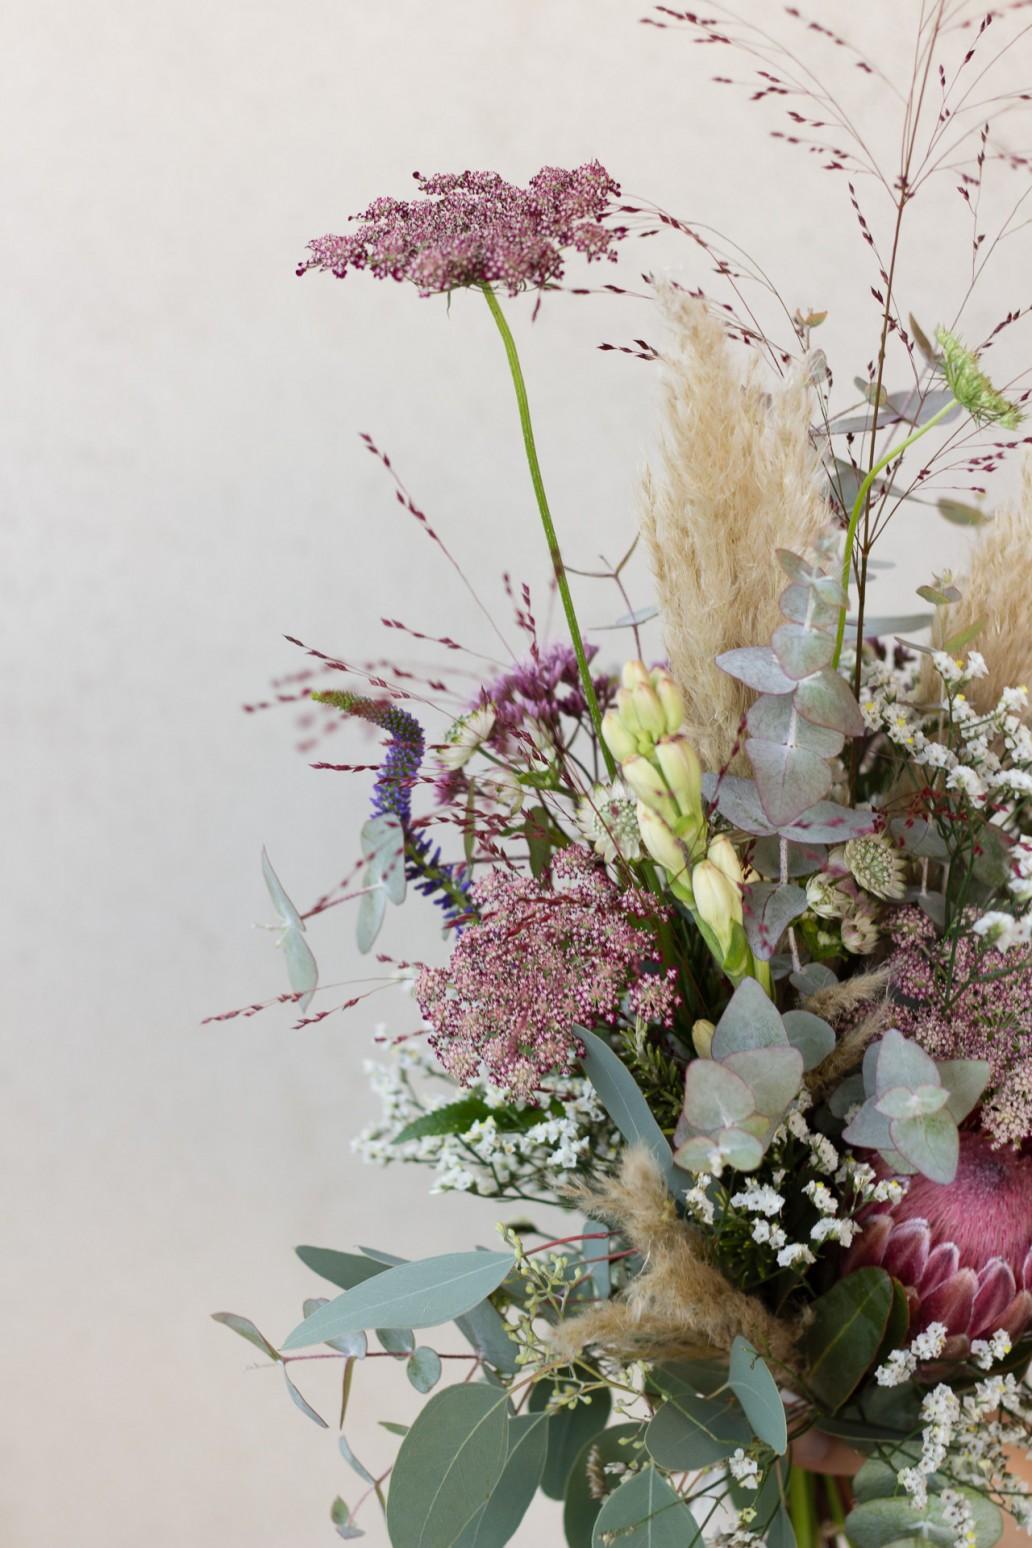 Atelier Lilas Wood - Fleuriste mariage lyon en Rhône alpes